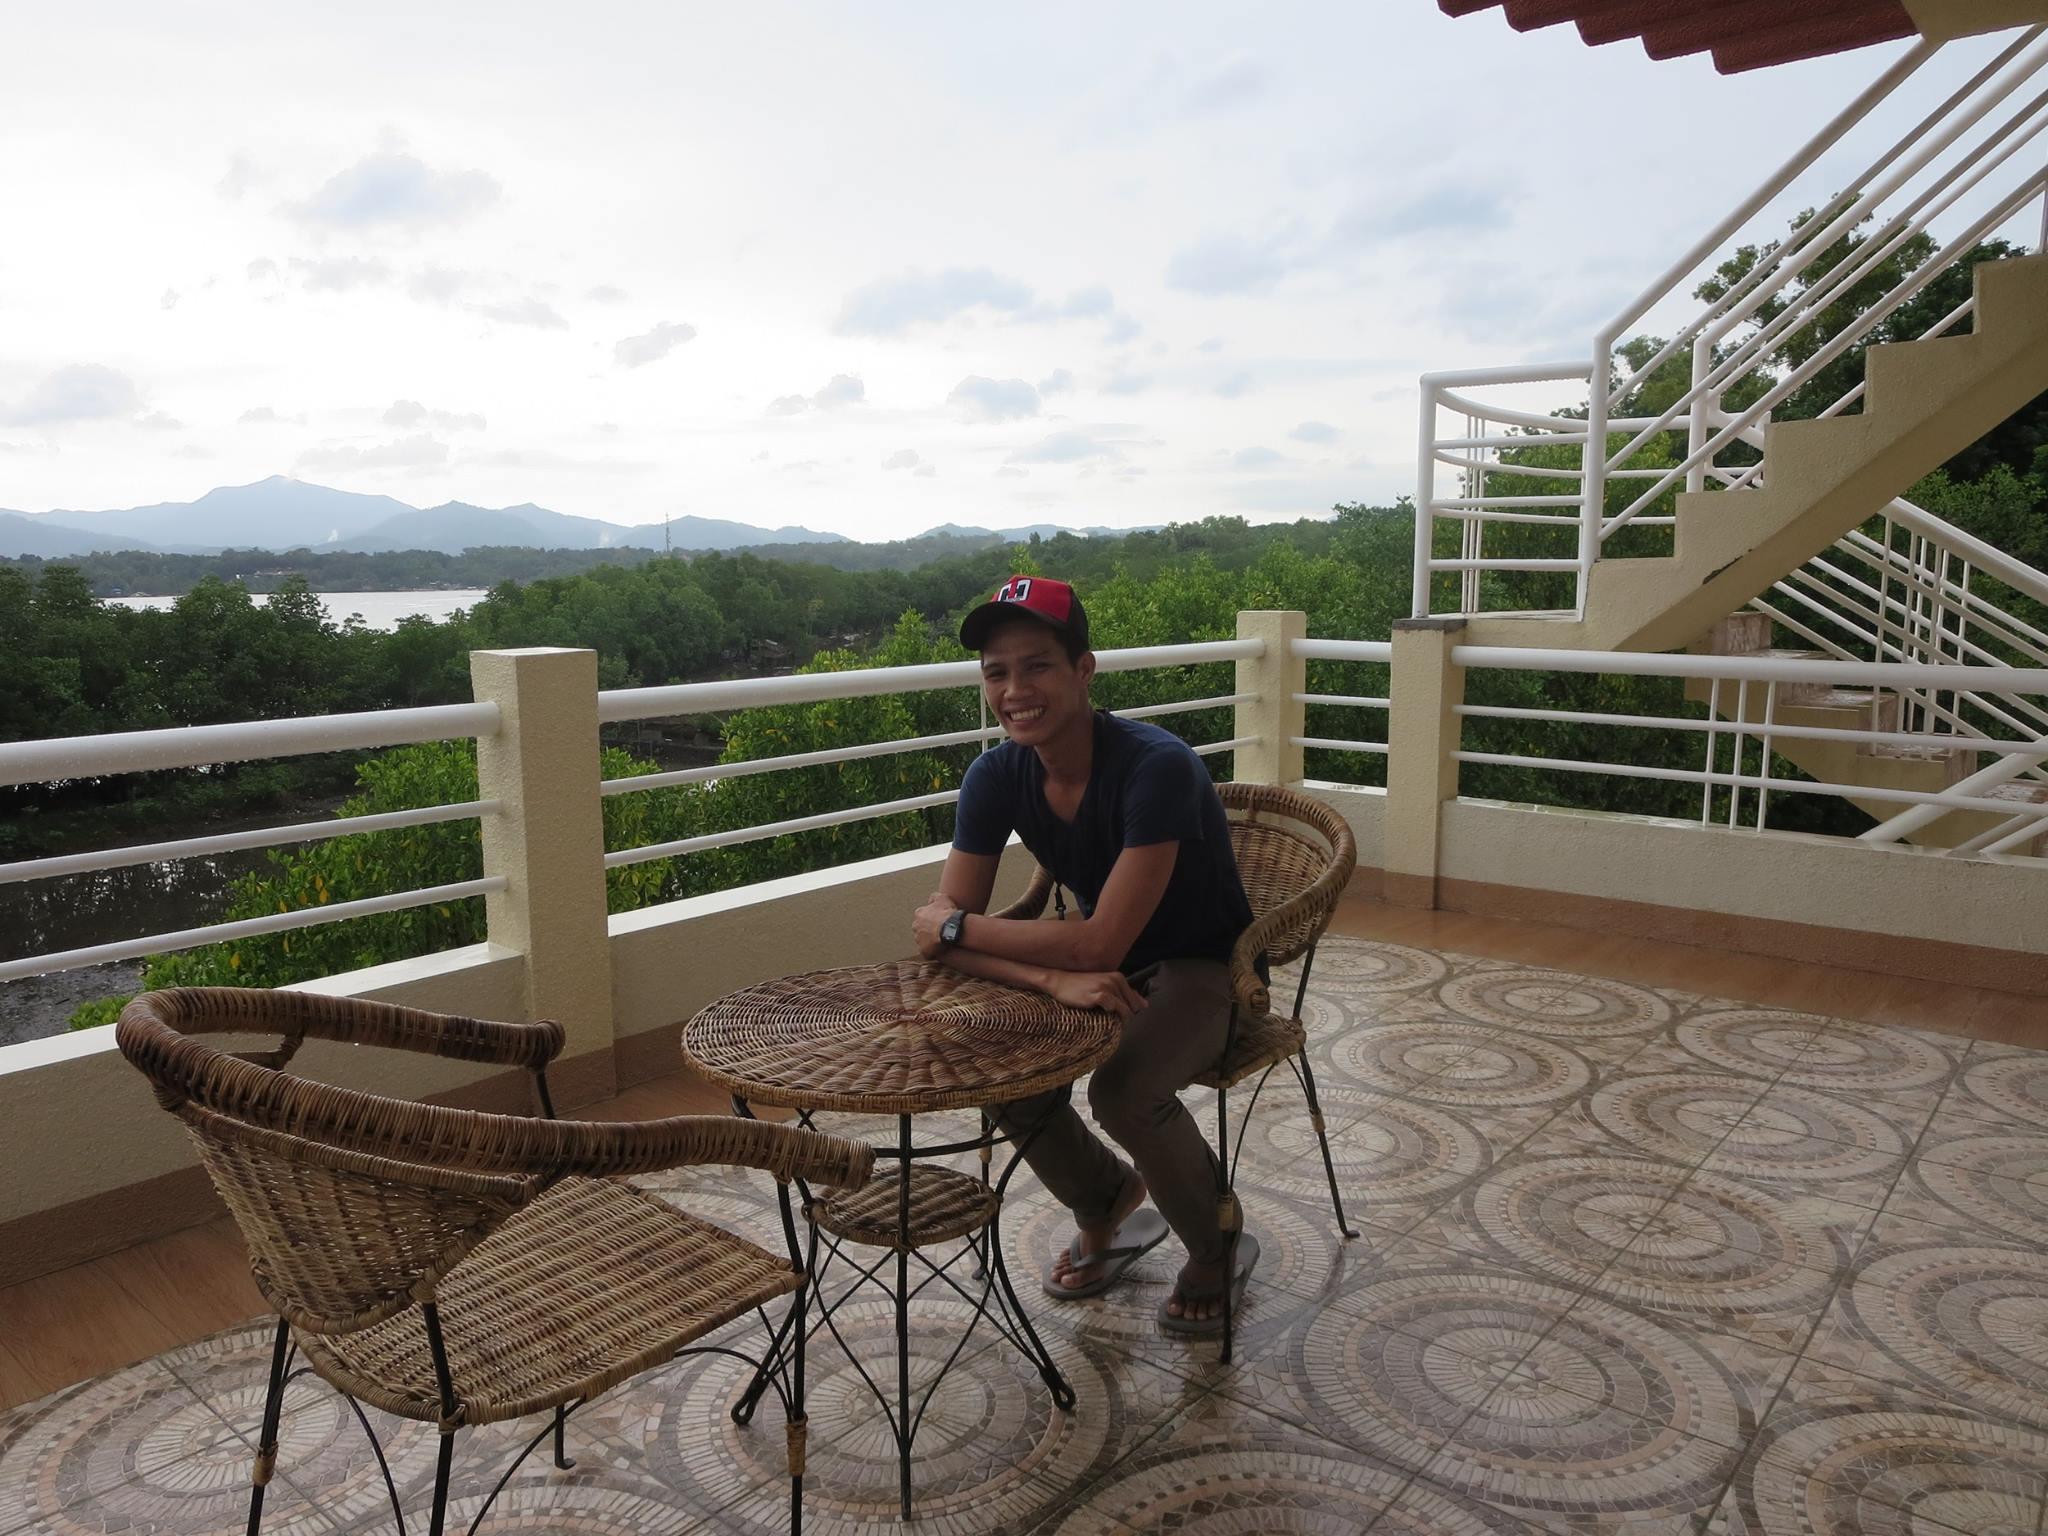 Enjoy a meal on the balcony